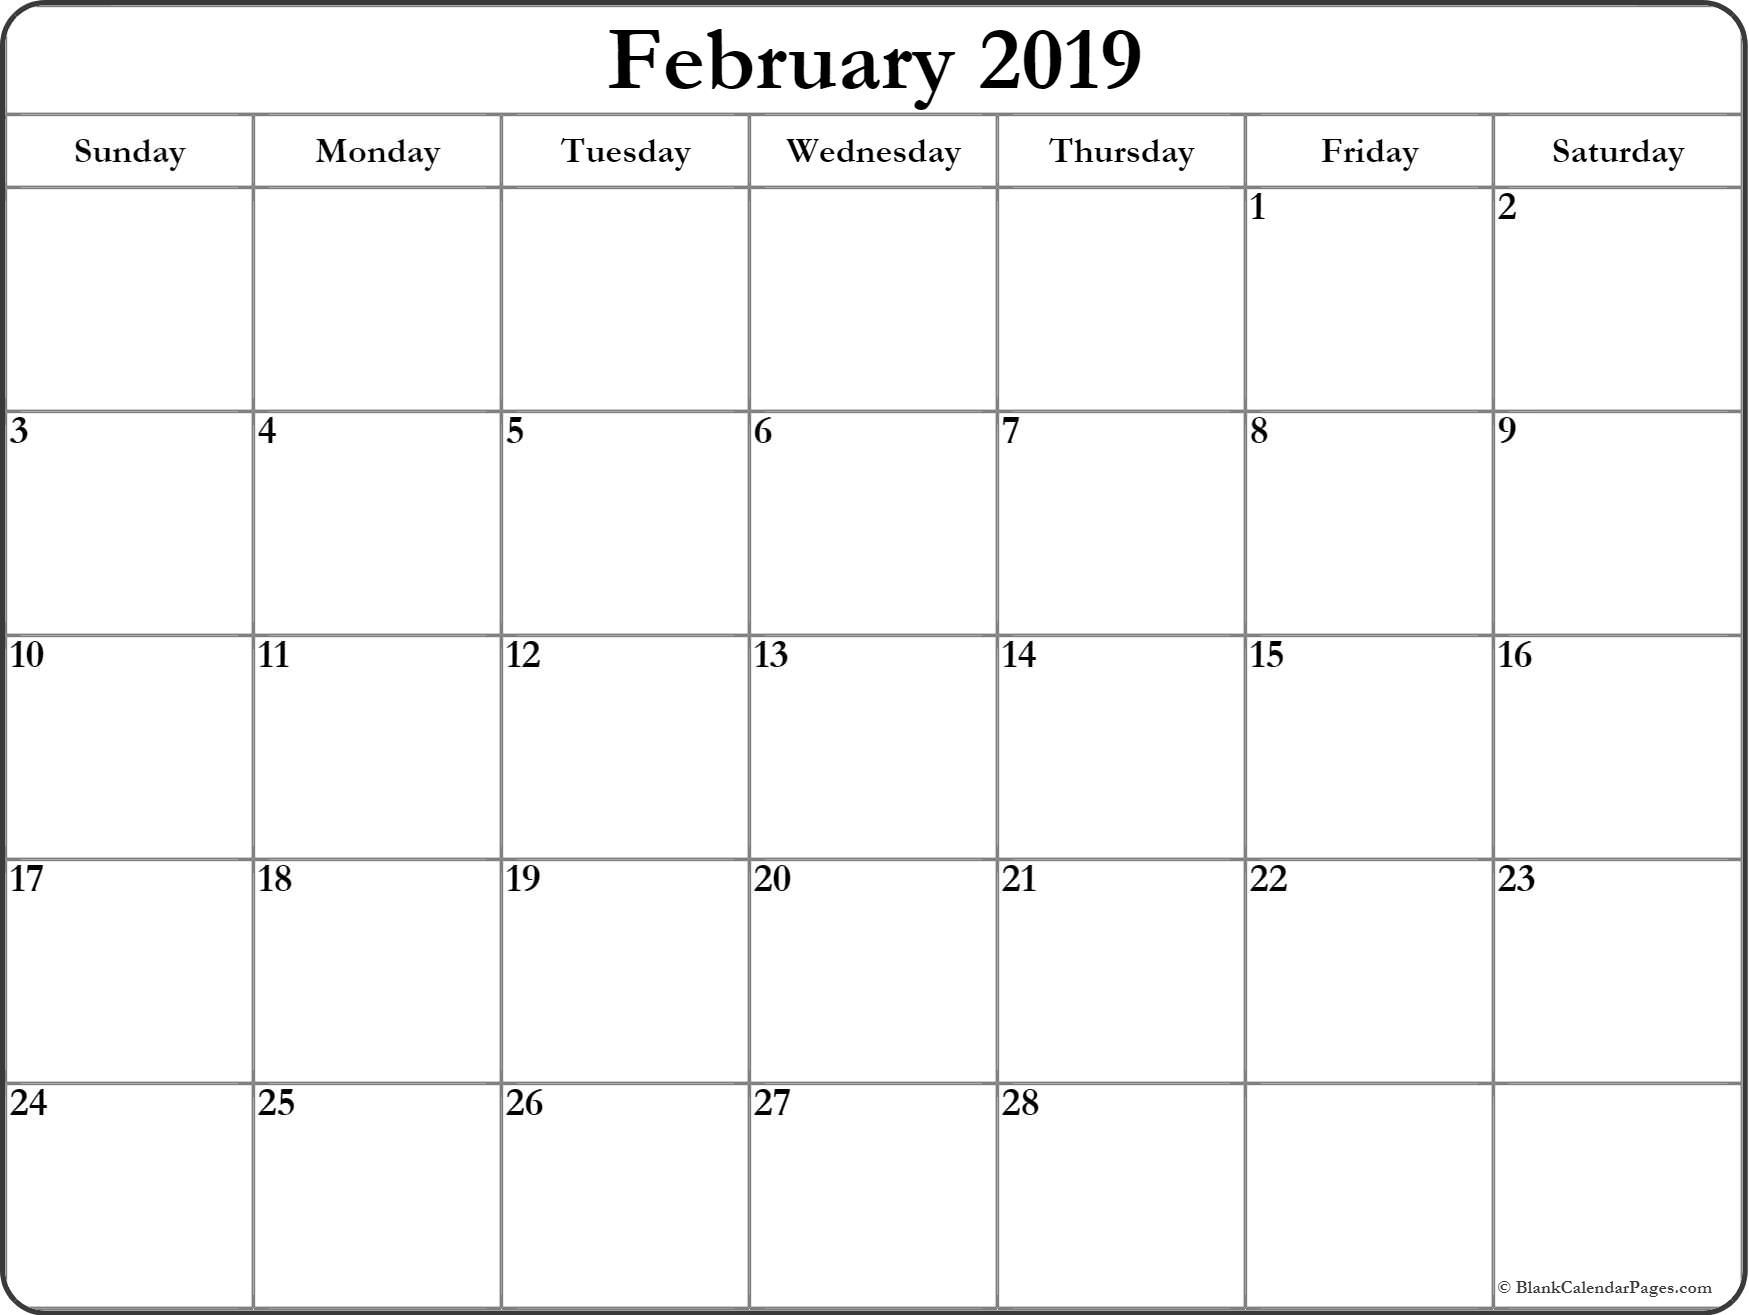 Blank 2019 Calendar February February blank calendar 2019 blank calendar #February #2019